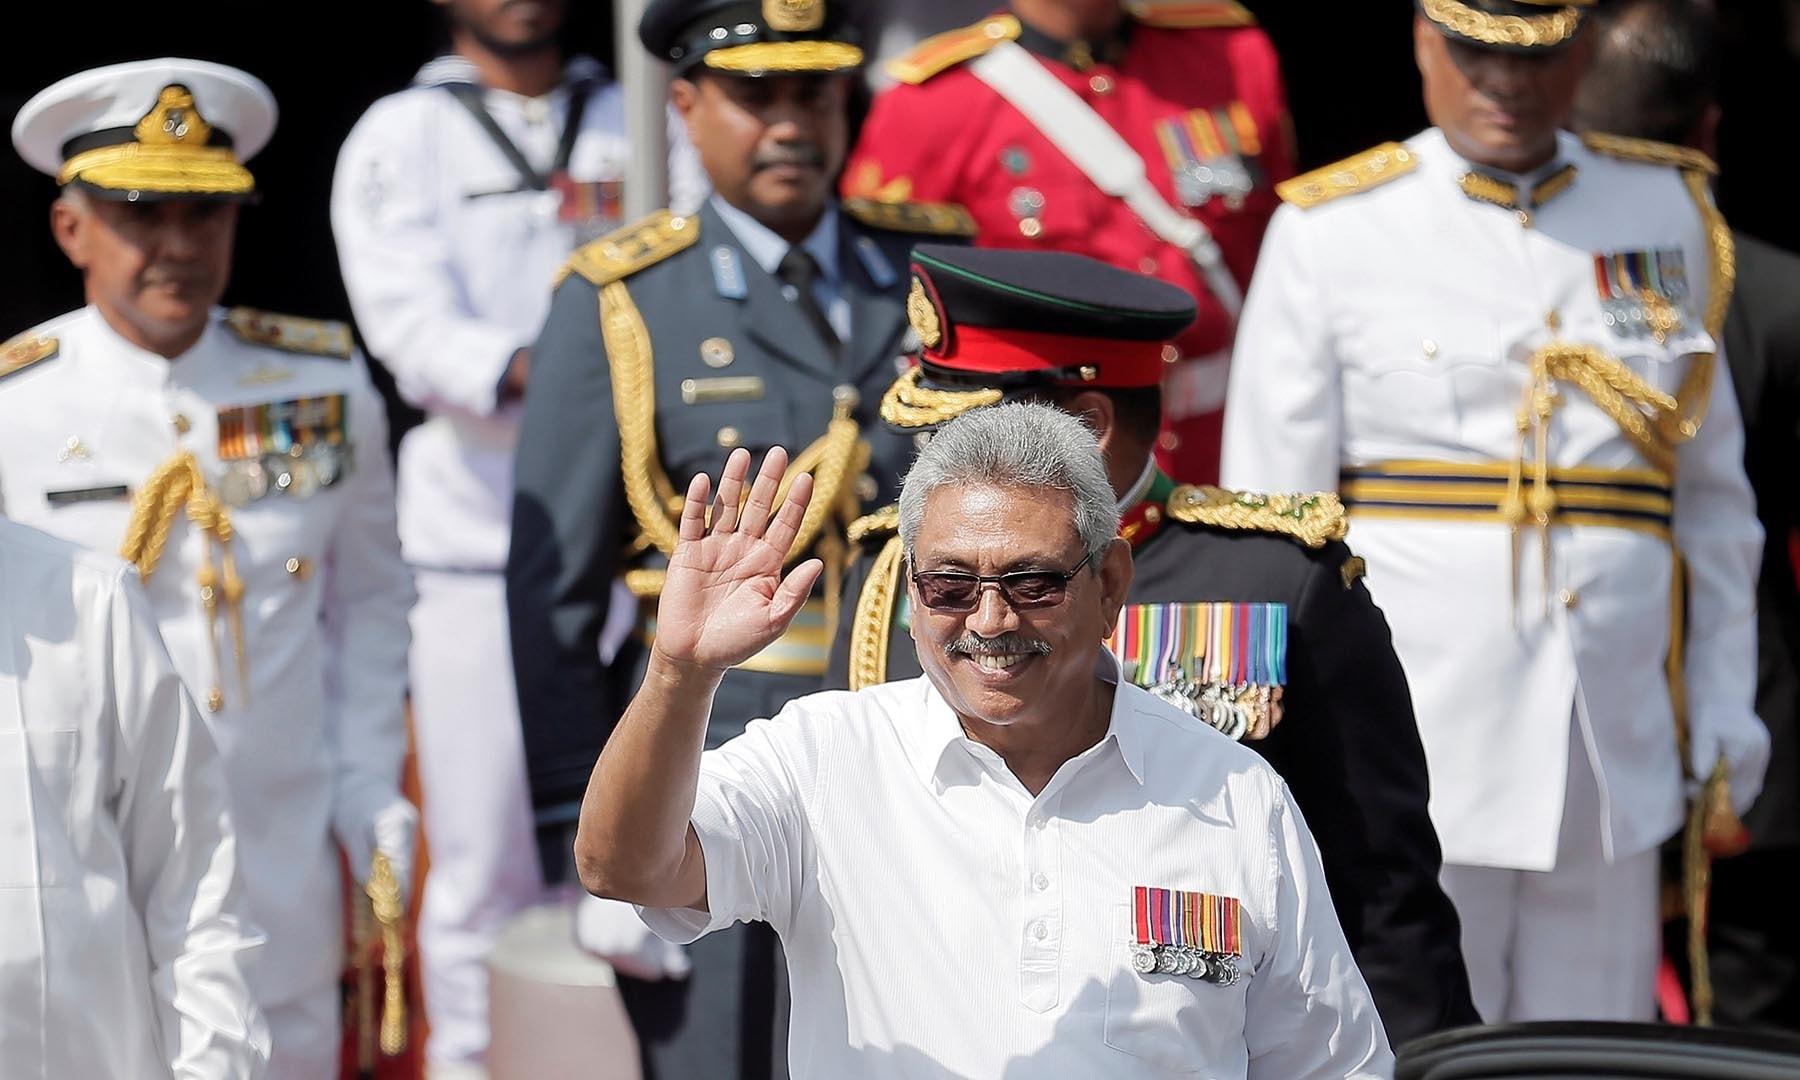 Sri Lanka's President Gotabaya Rajapaksa waves during the 72nd independence day ceremony, in Colombo, Sri Lanka on February 4. — Reuters